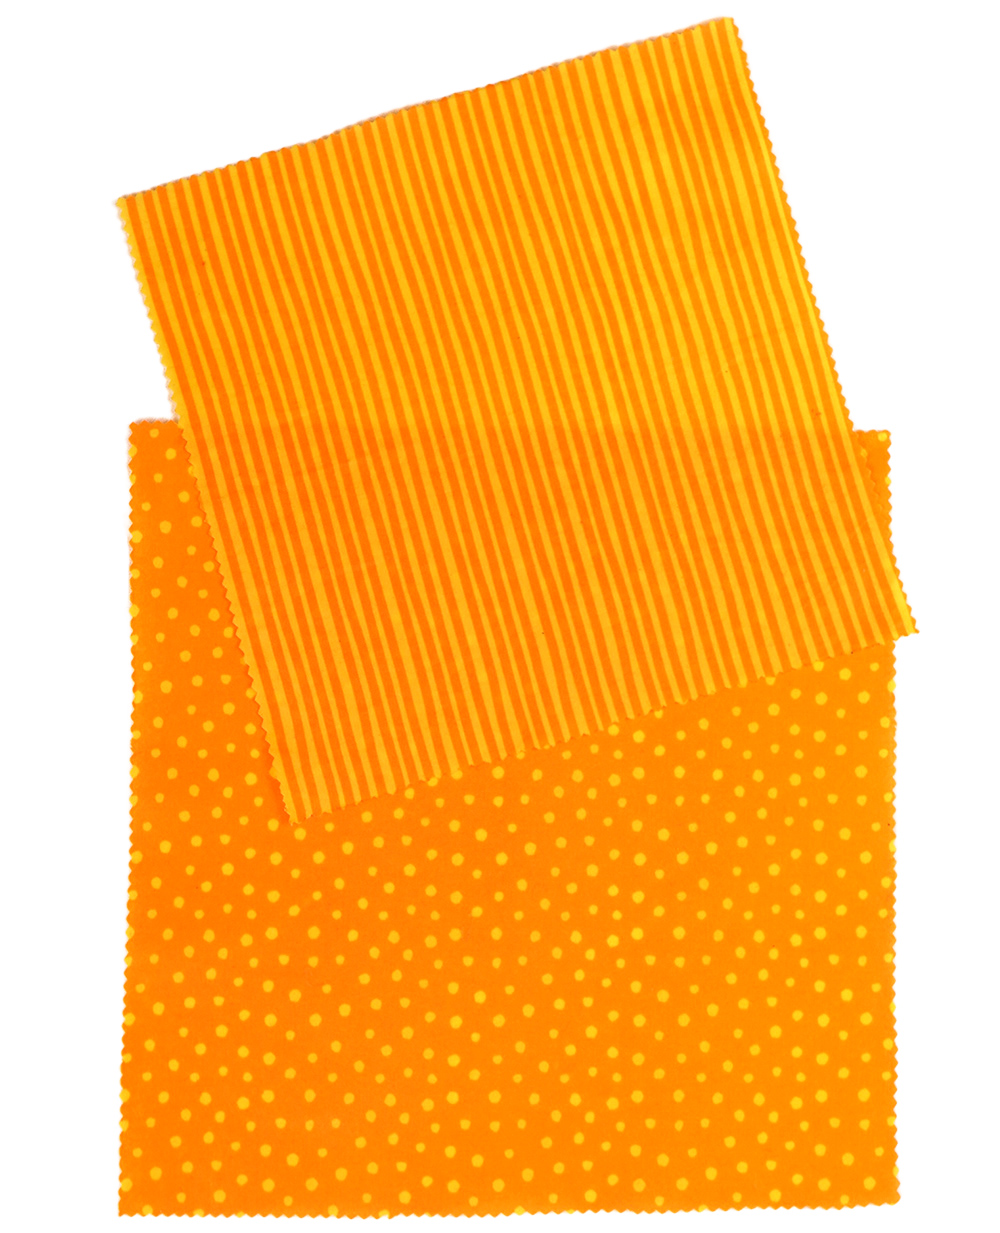 Stoffmuster orange